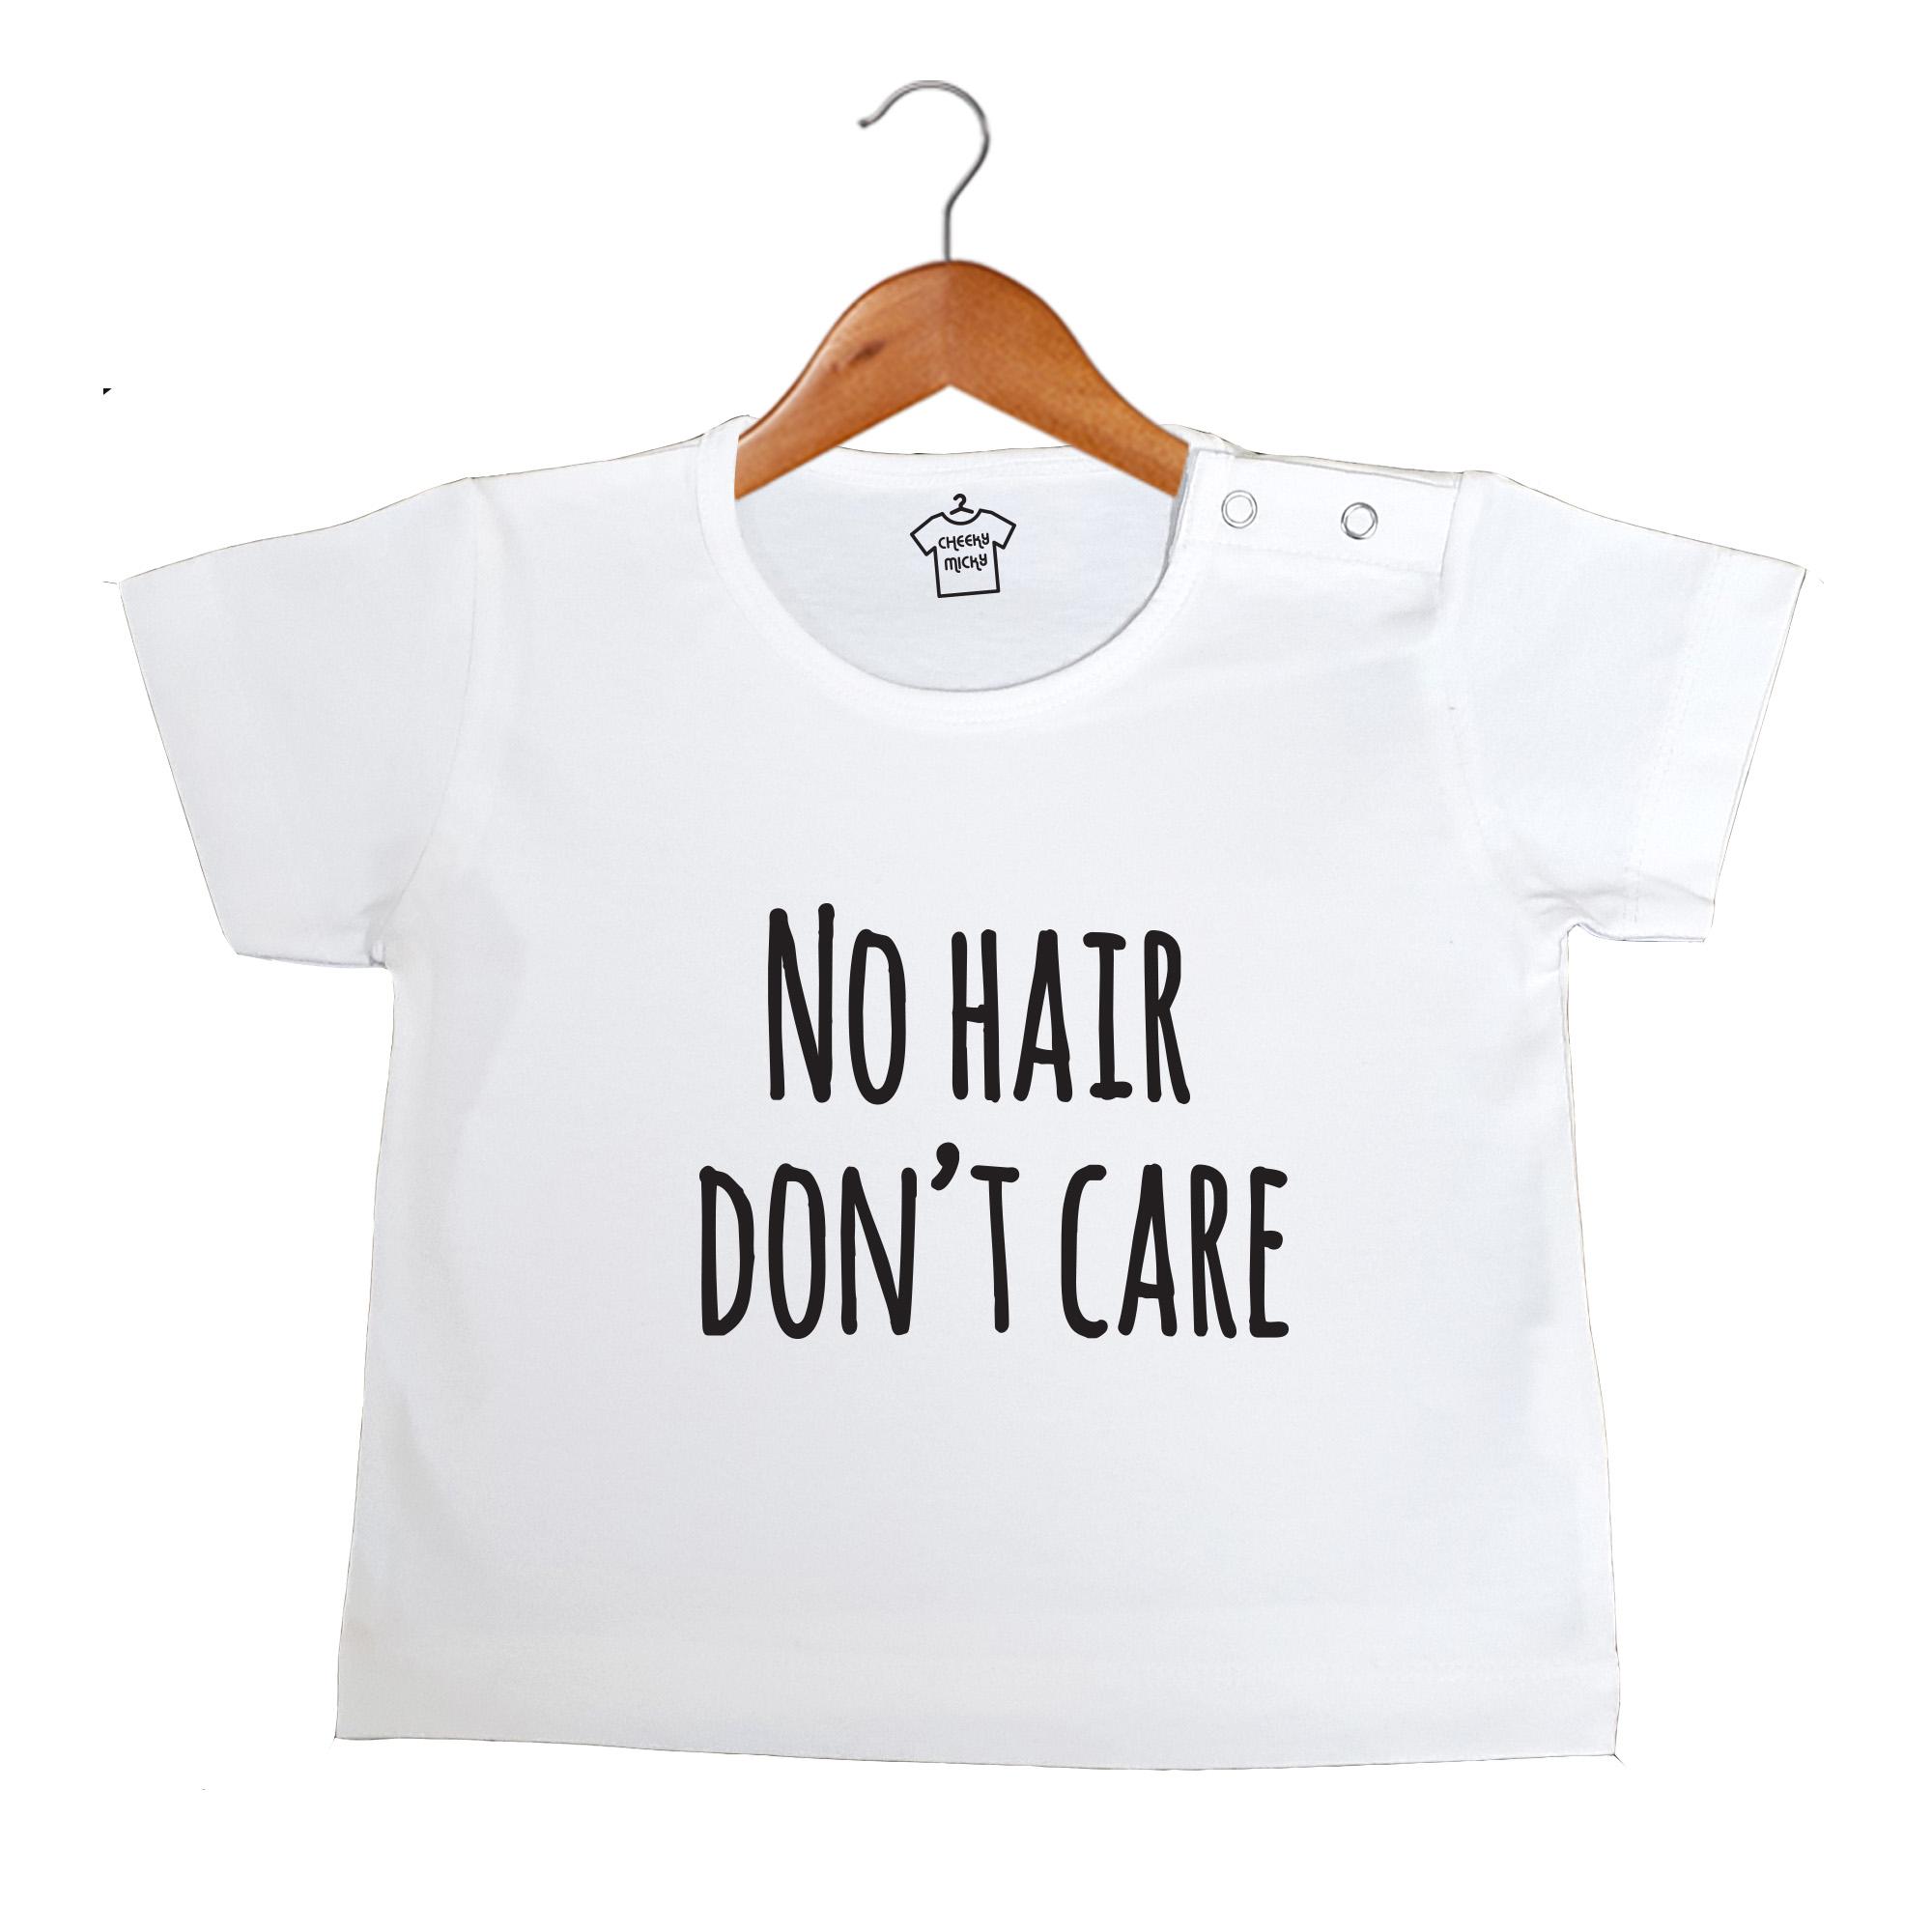 White T-shirt, 100% cotton, machine washable. Age 6-12 months. Print: No Hair Don't Care.